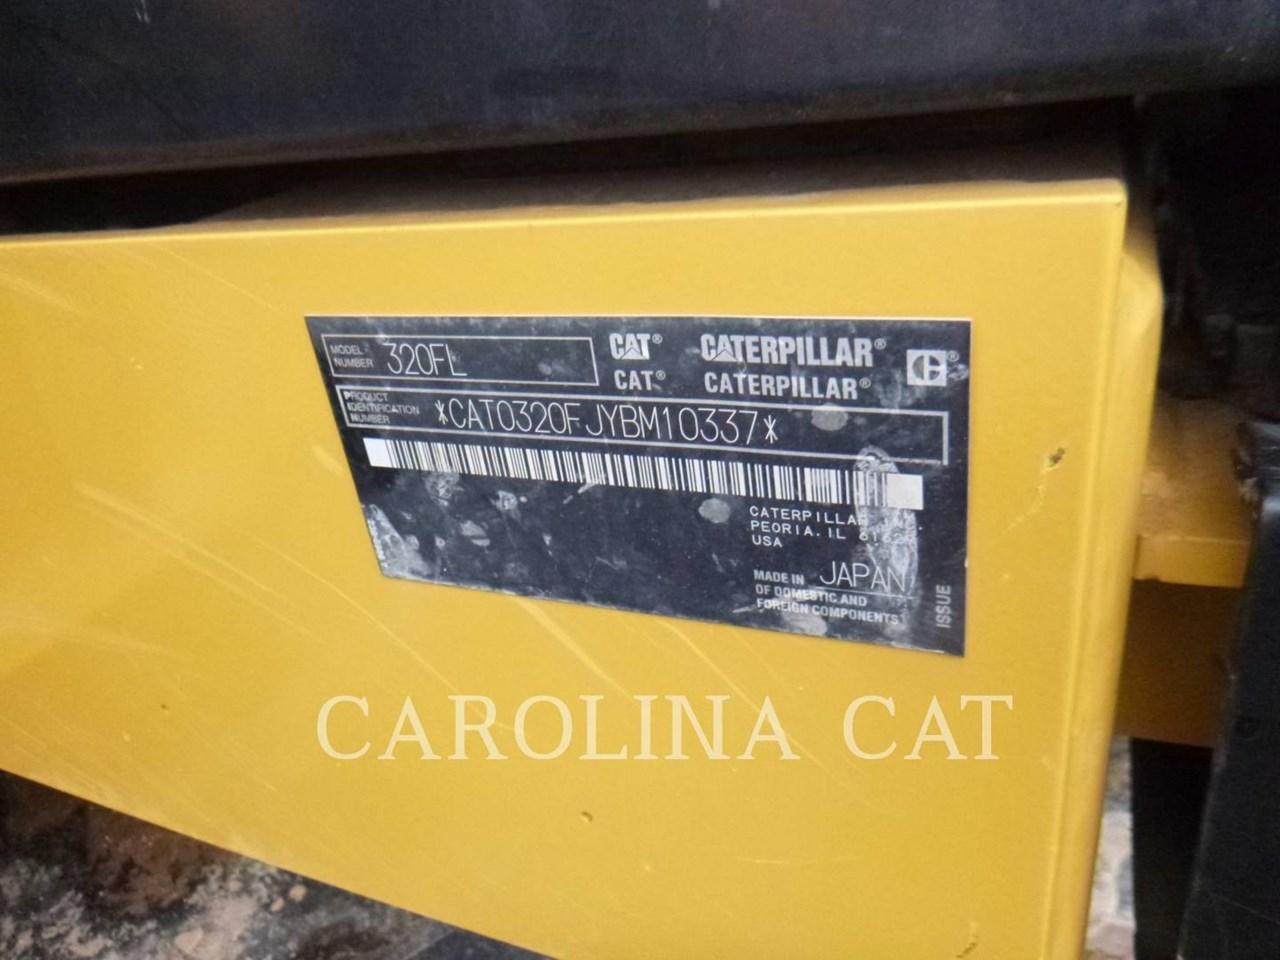 2017 Caterpillar 320FL Image 6